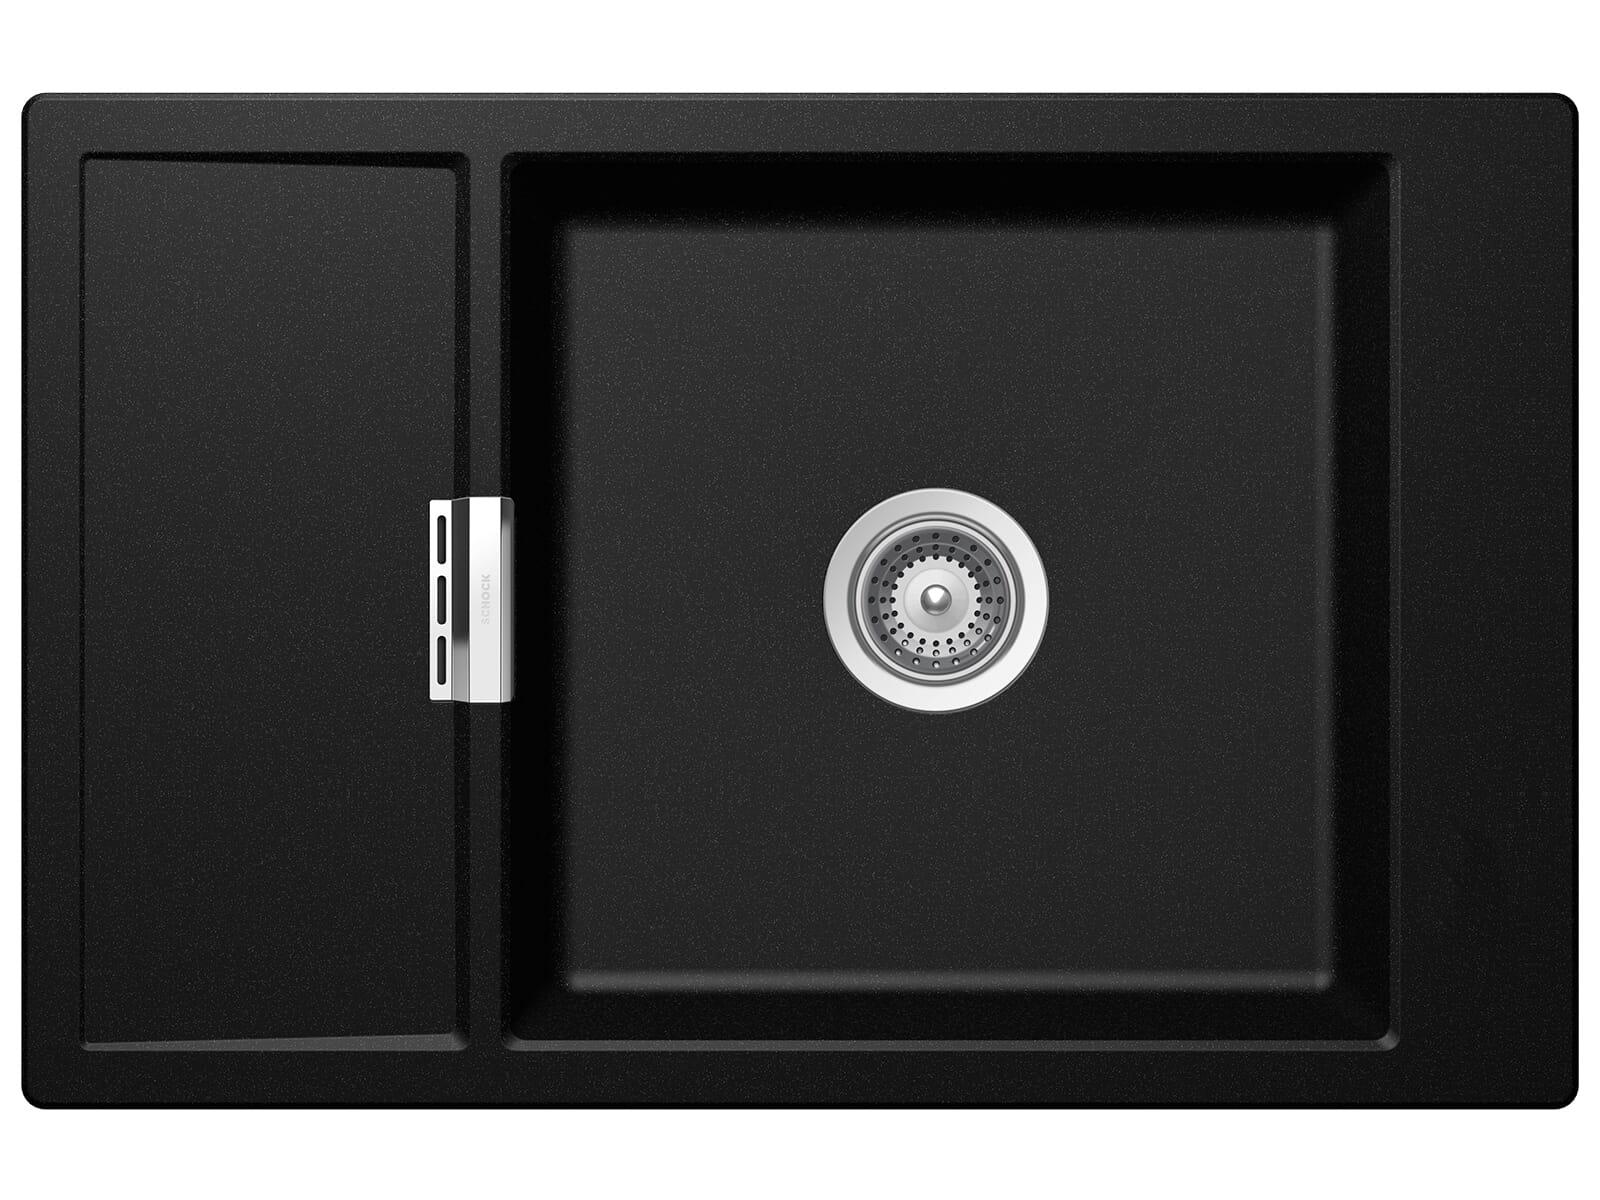 Schock Mono D-100XS A Magma - MOND100XSAMAG Granitspüle